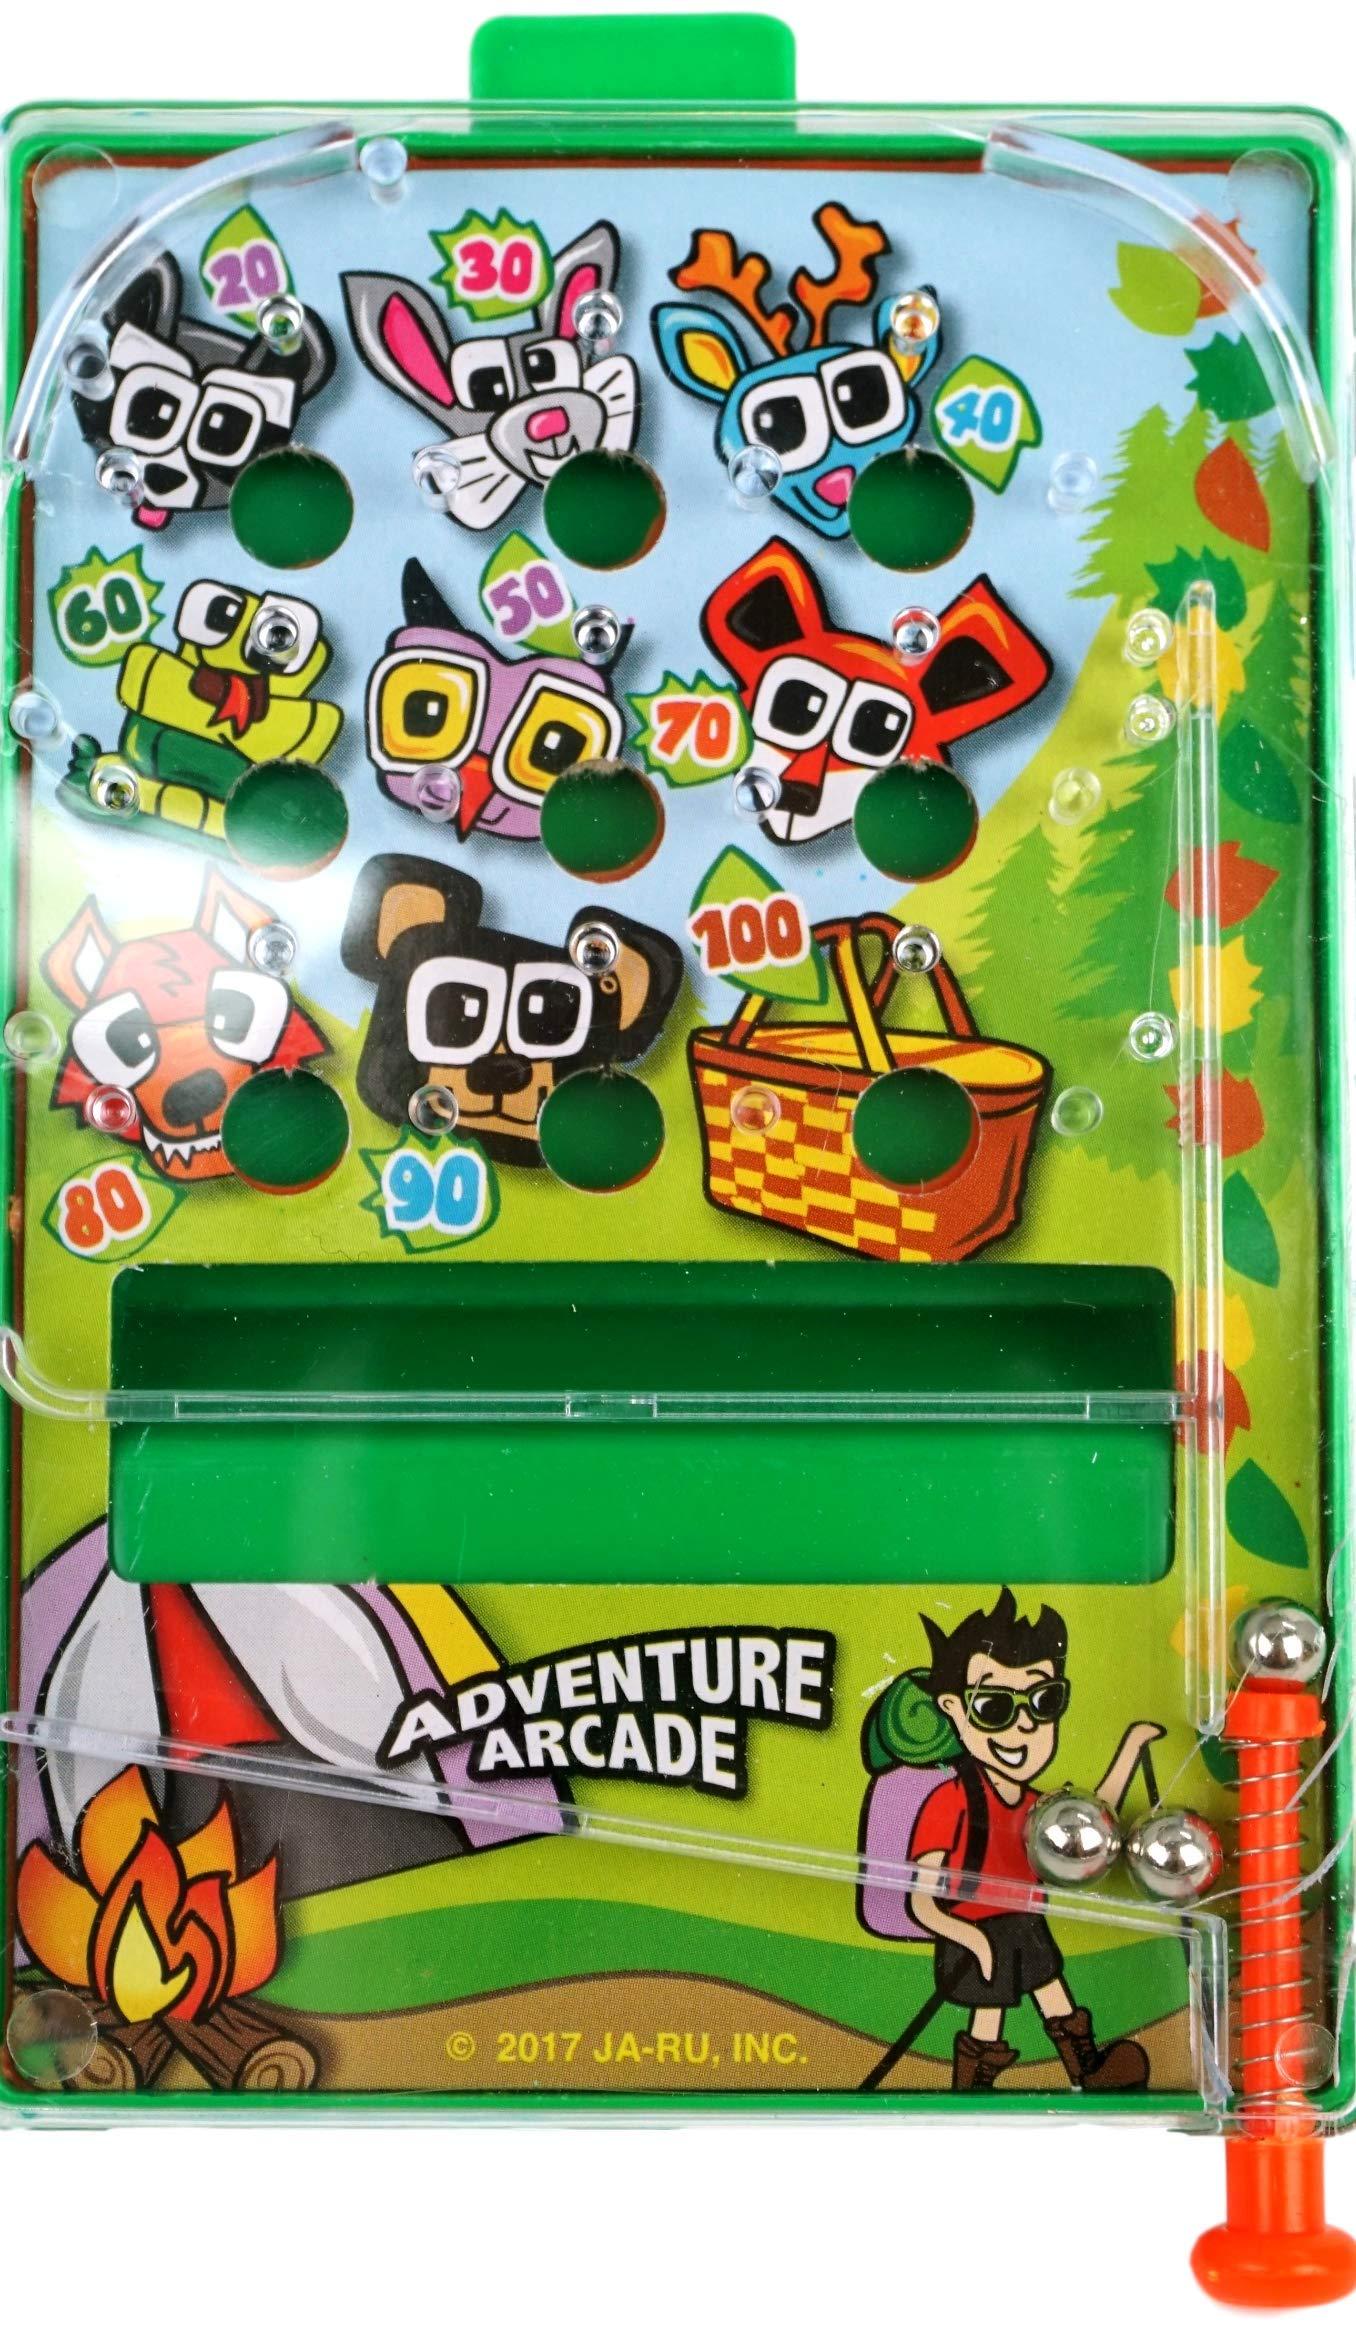 JA-RU Pinball Pocket Travel Game (144 Units) and one Bouncy Ball Item #3258-144p by JA-RU (Image #3)